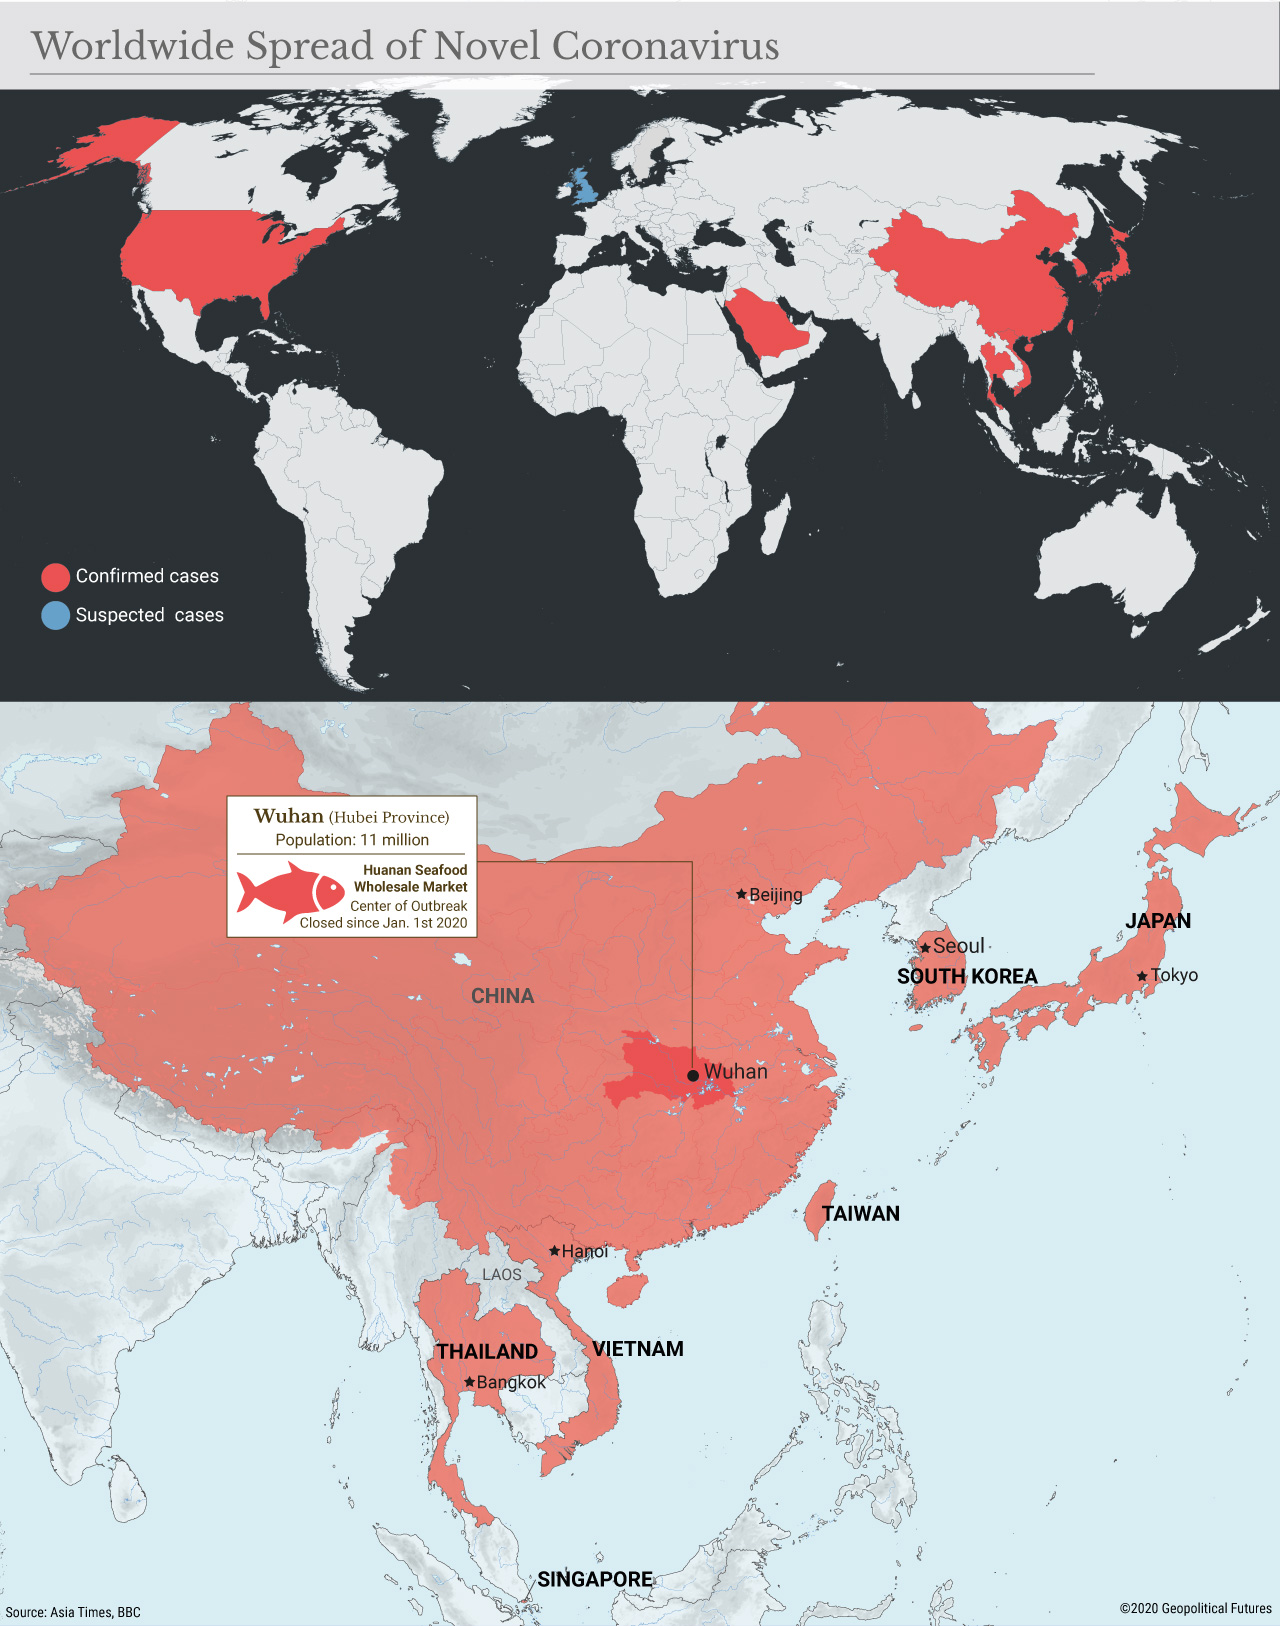 Worldwide Spread of Novel Coronavirus